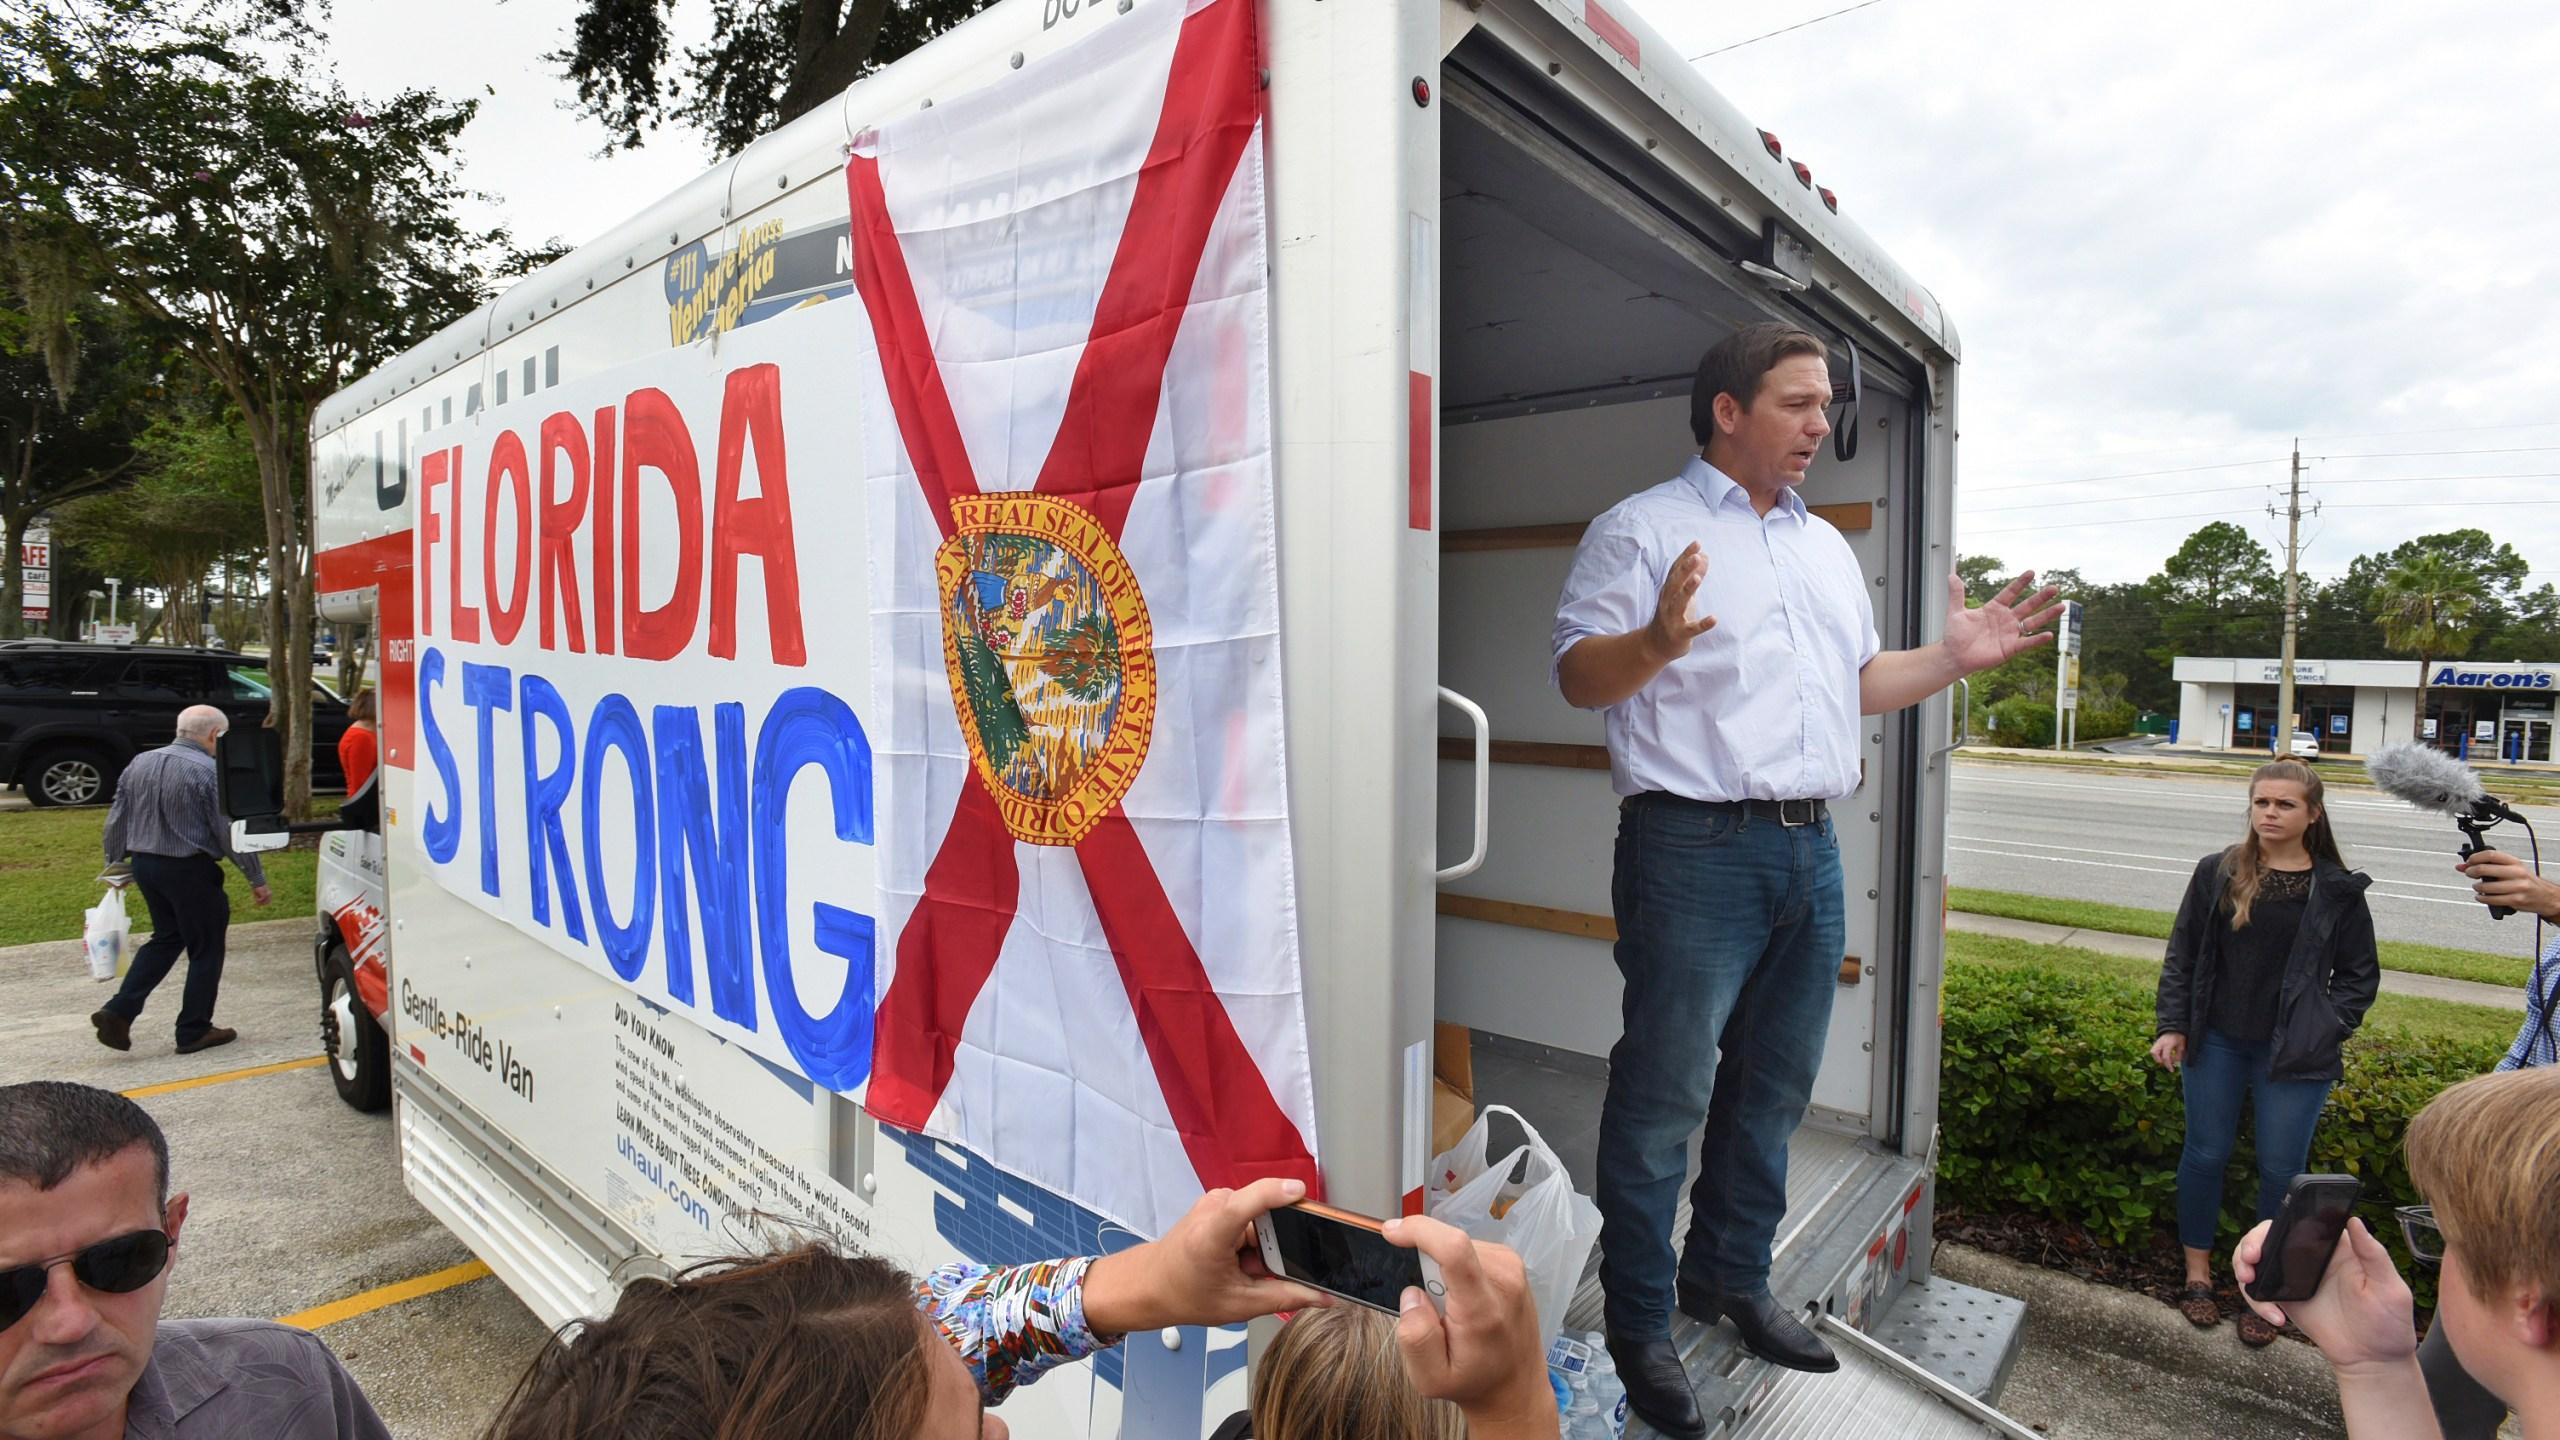 Governor_Florida_40478-159532.jpg85607132